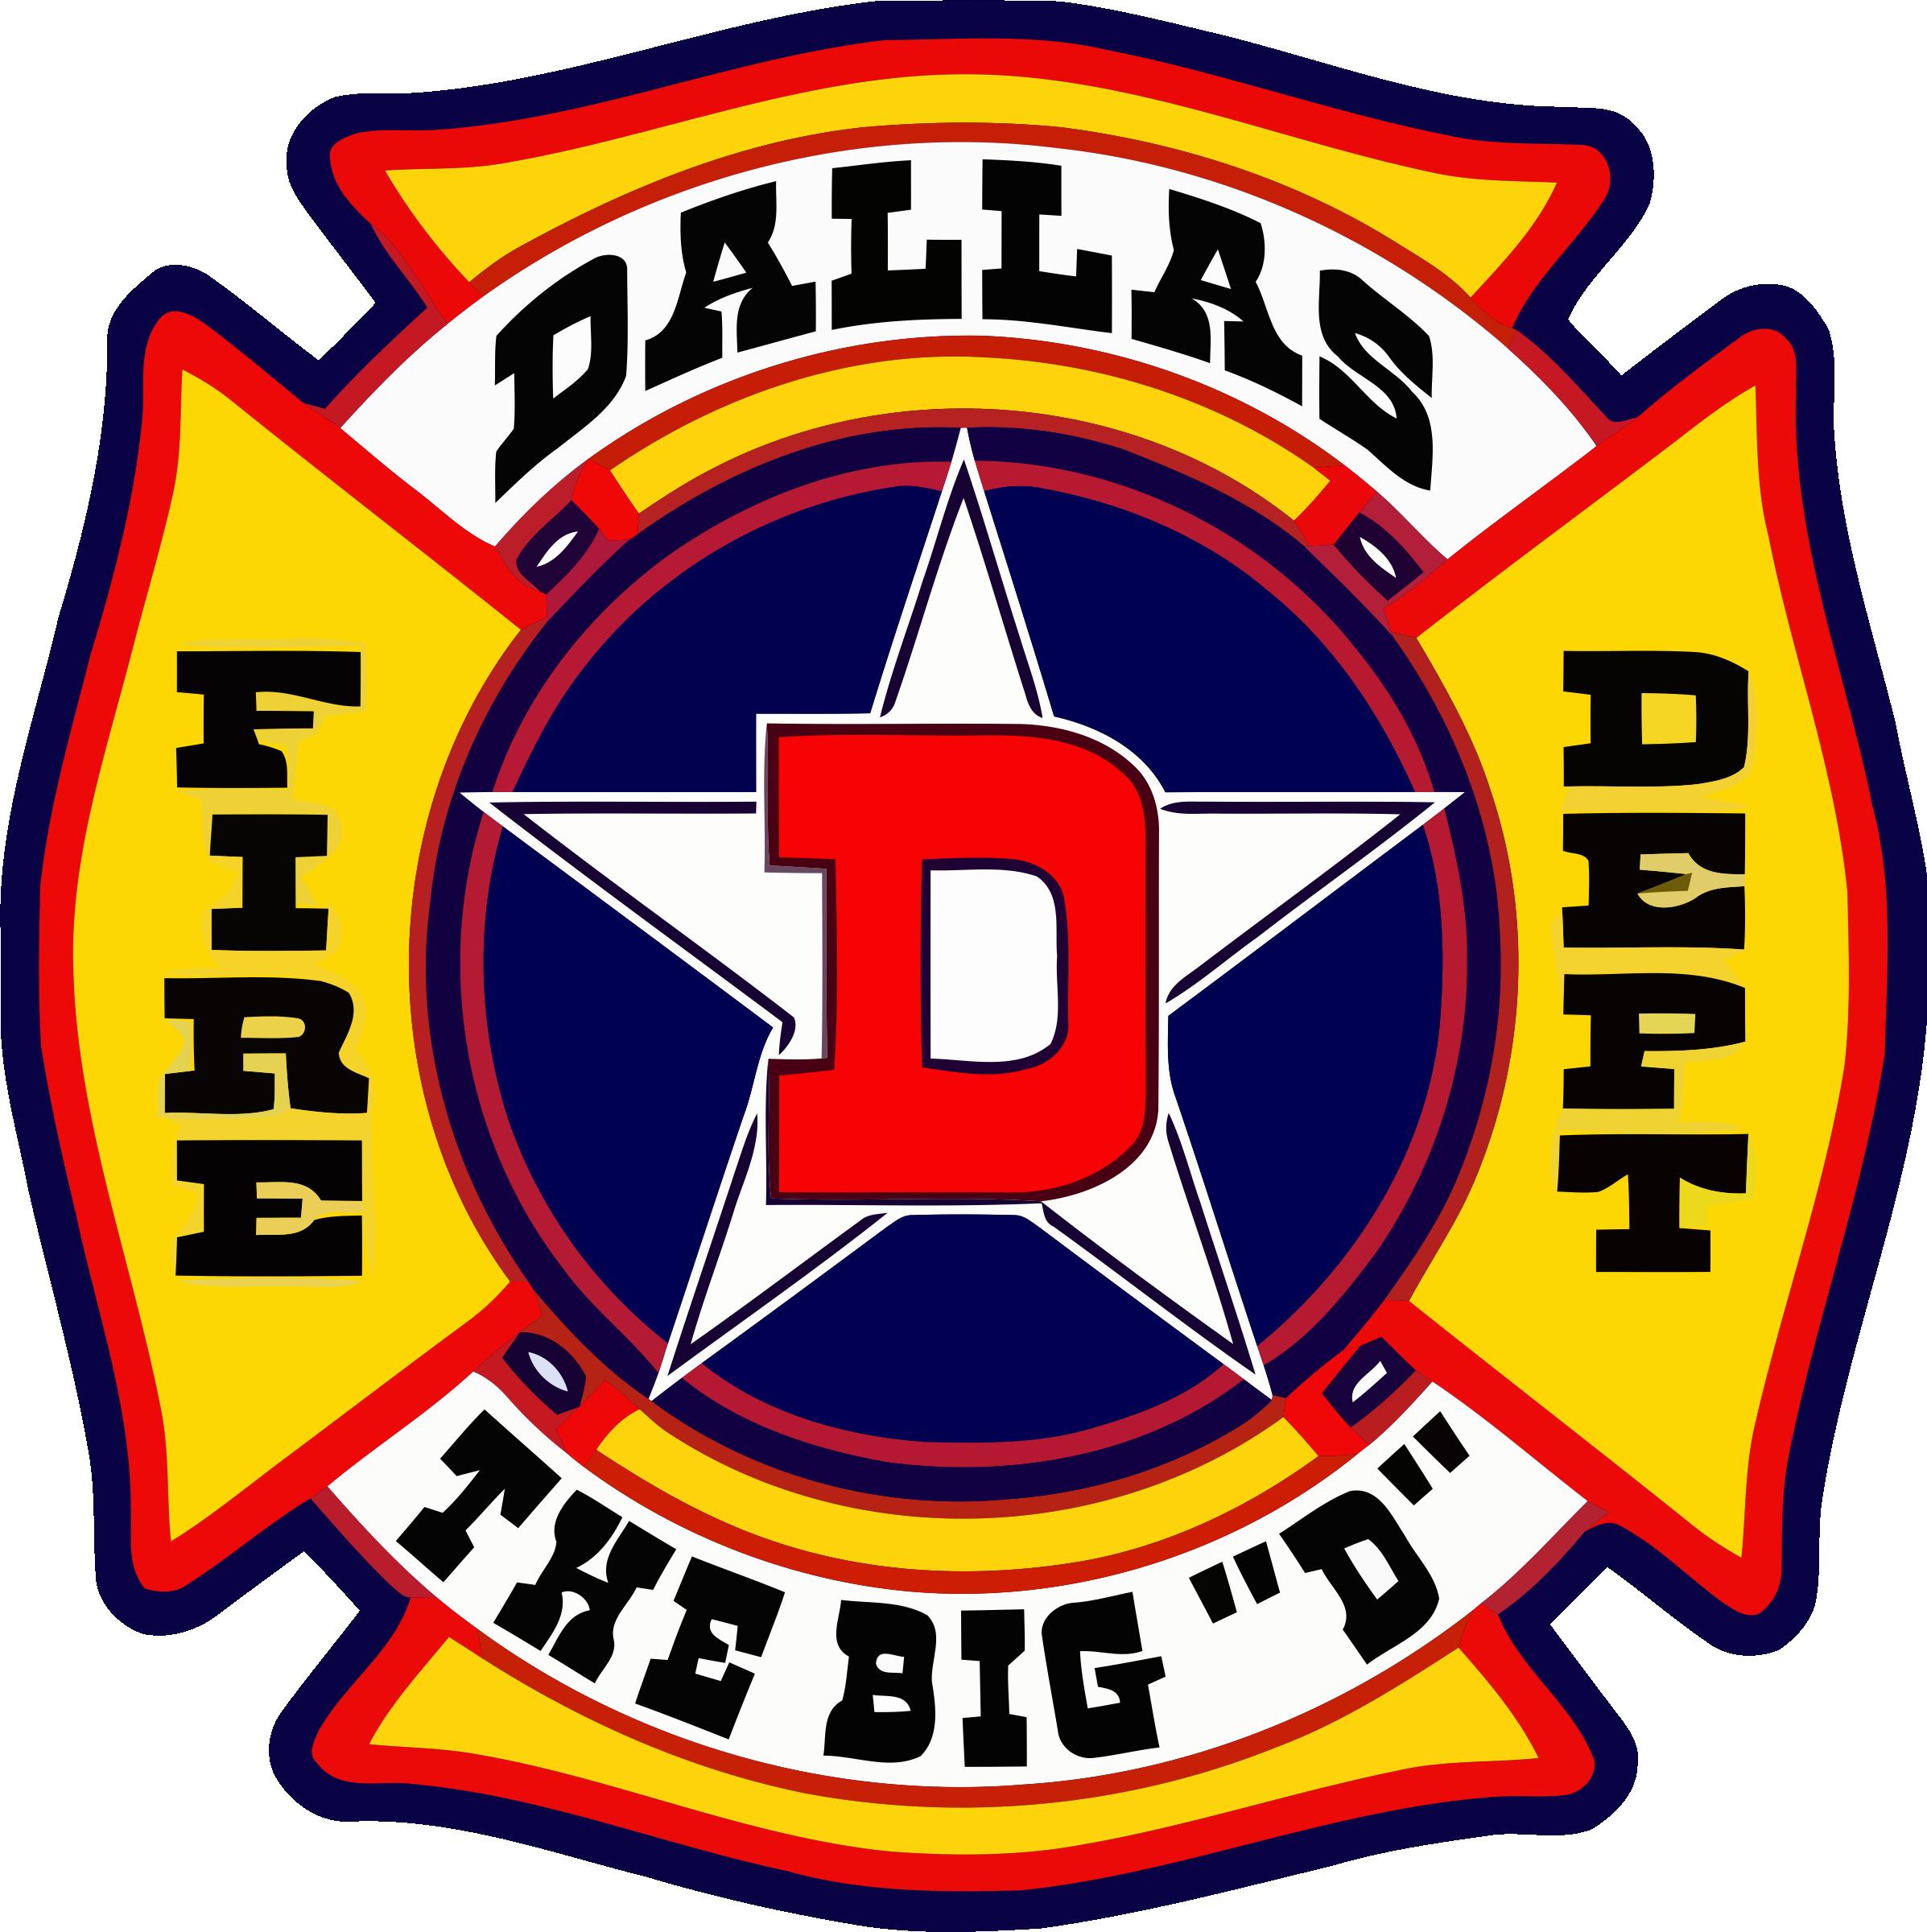 Dallas Texas Fire Dept. Sticker By